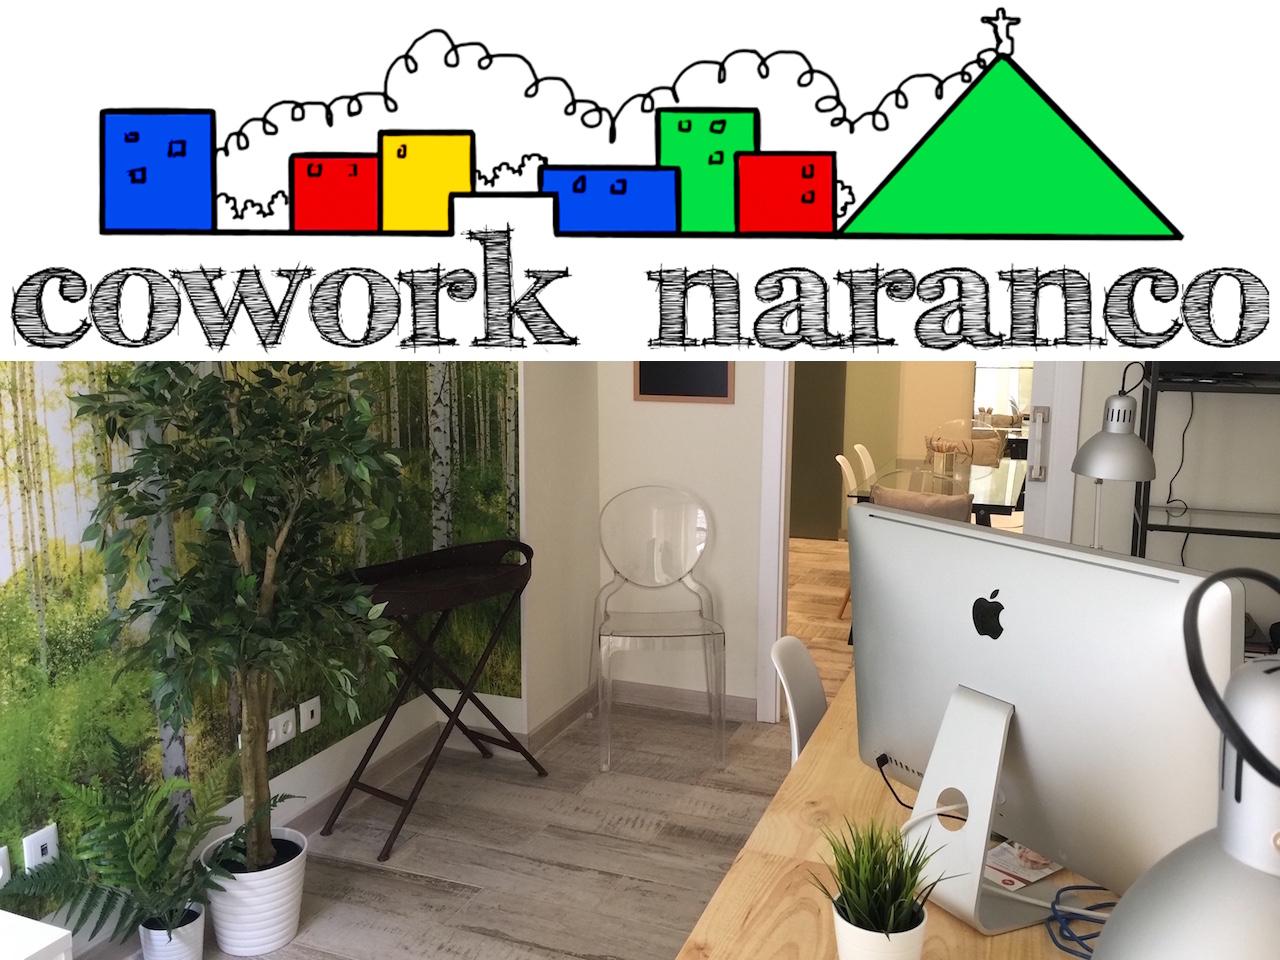 Coworkingasturias alquiler de oficinas por horas en for Oficinas por horas